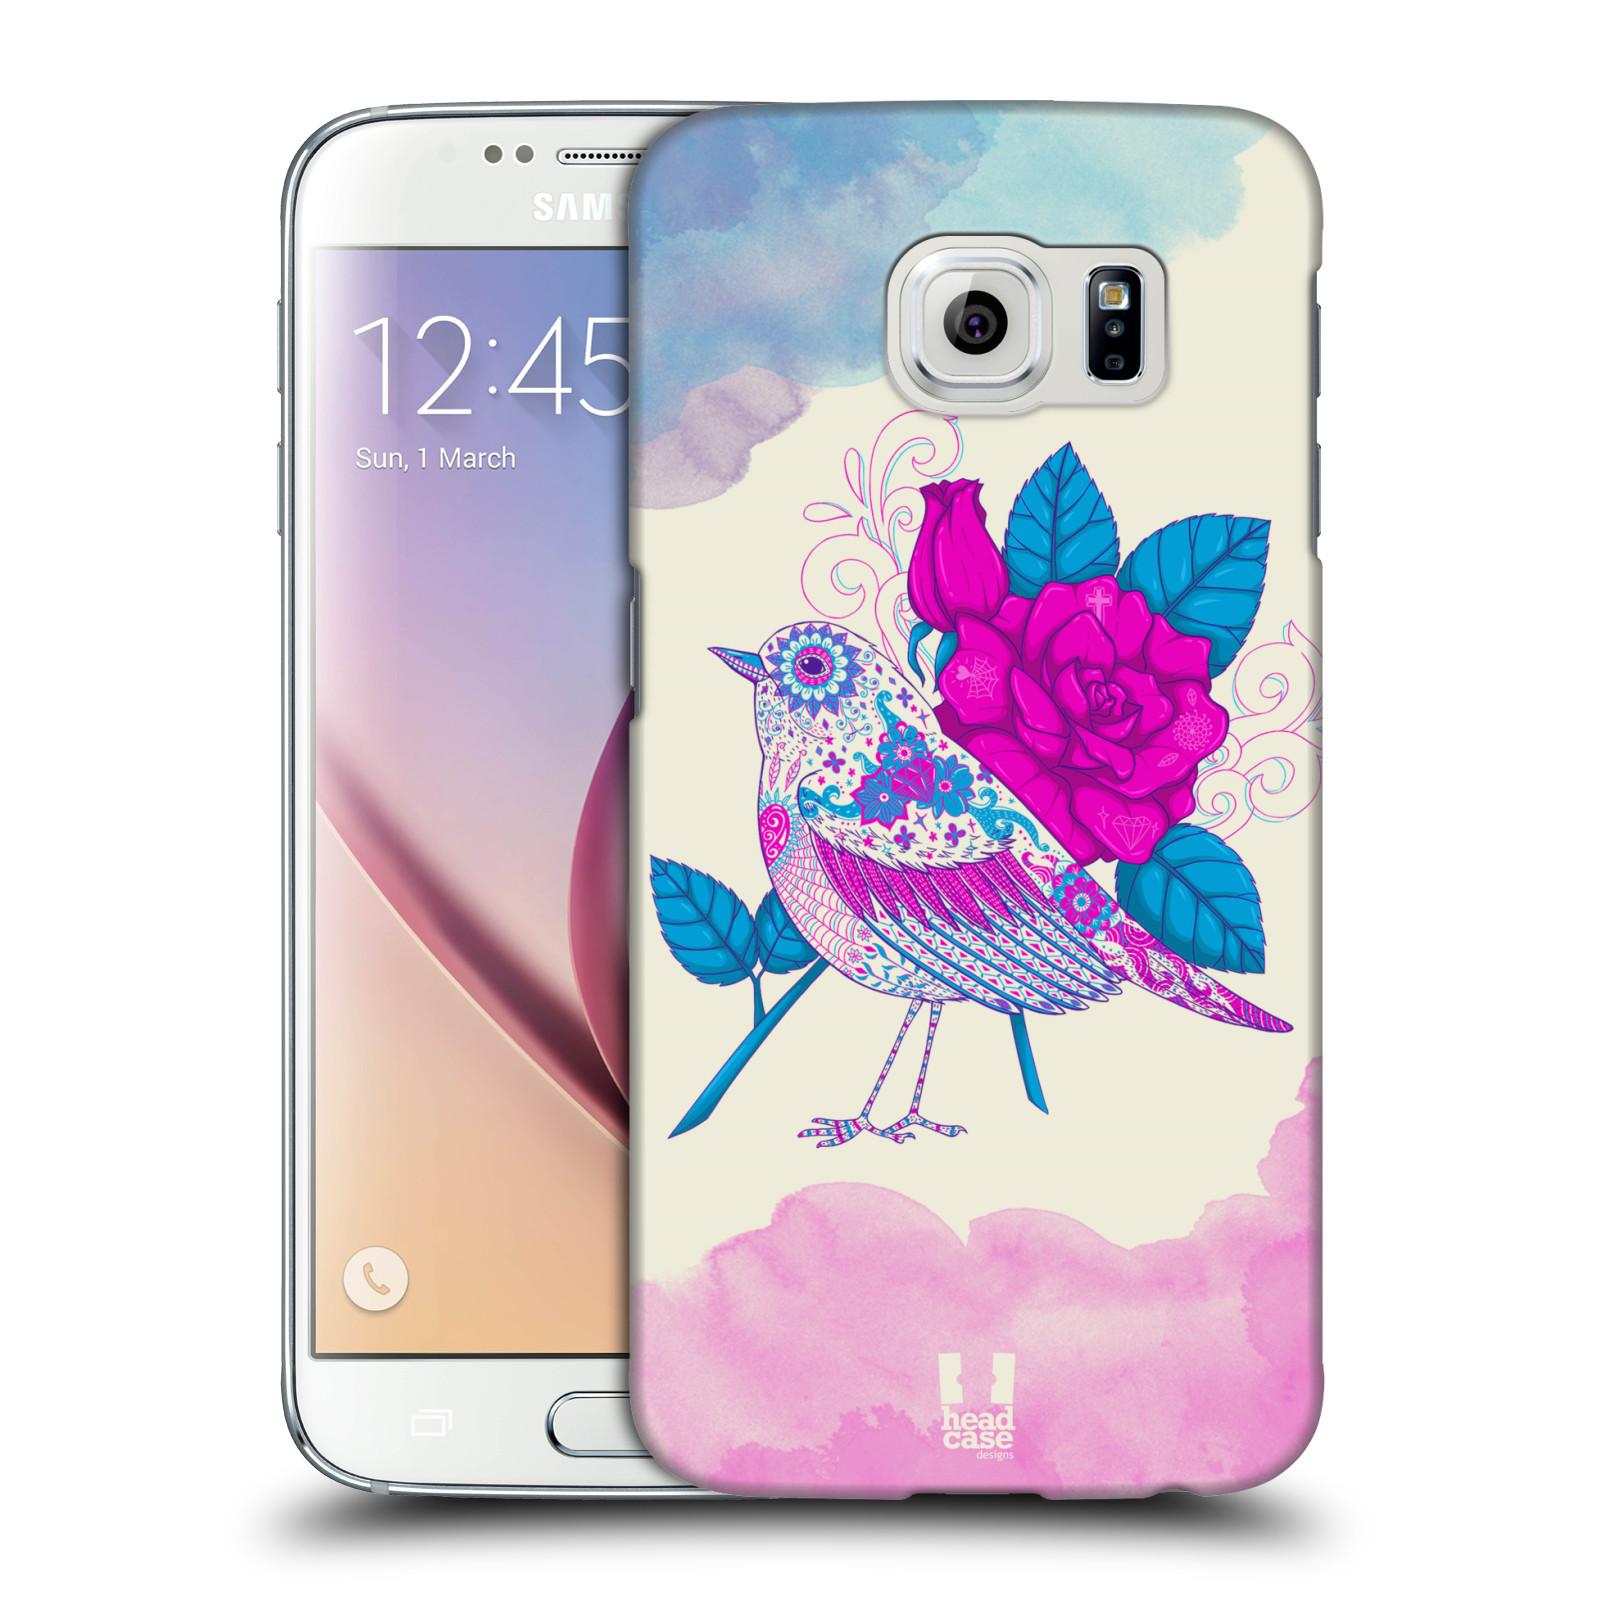 HEAD CASE plastový obal na mobil SAMSUNG Galaxy S6 (G9200, G920F) vzor Květina ptáčci FIALOVÁ